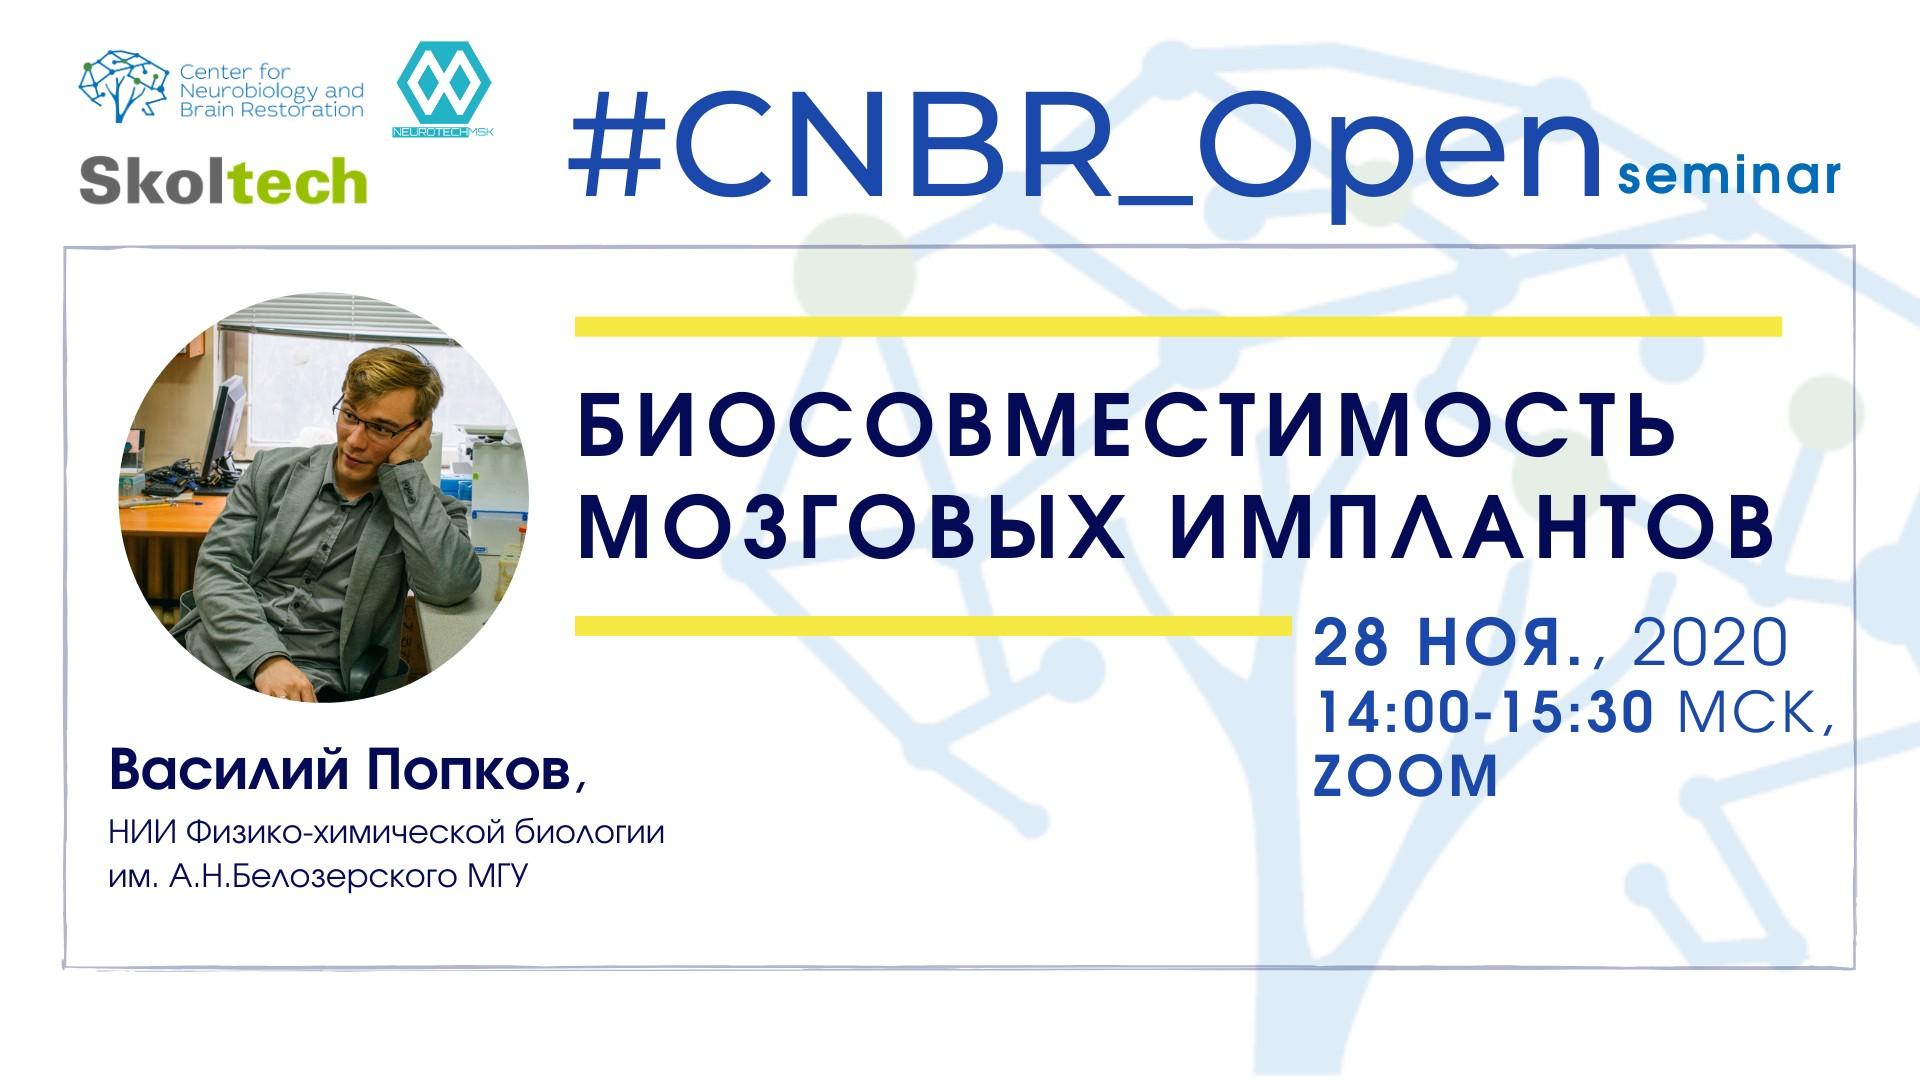 cnbr_open_vasily-popkov